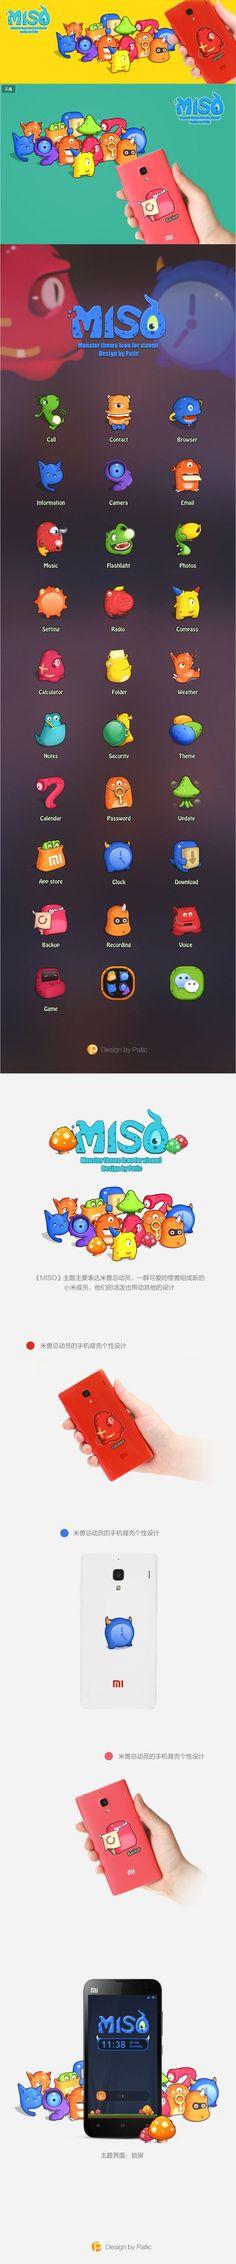 《MISO》or《米兽》-UI中国-专业...: